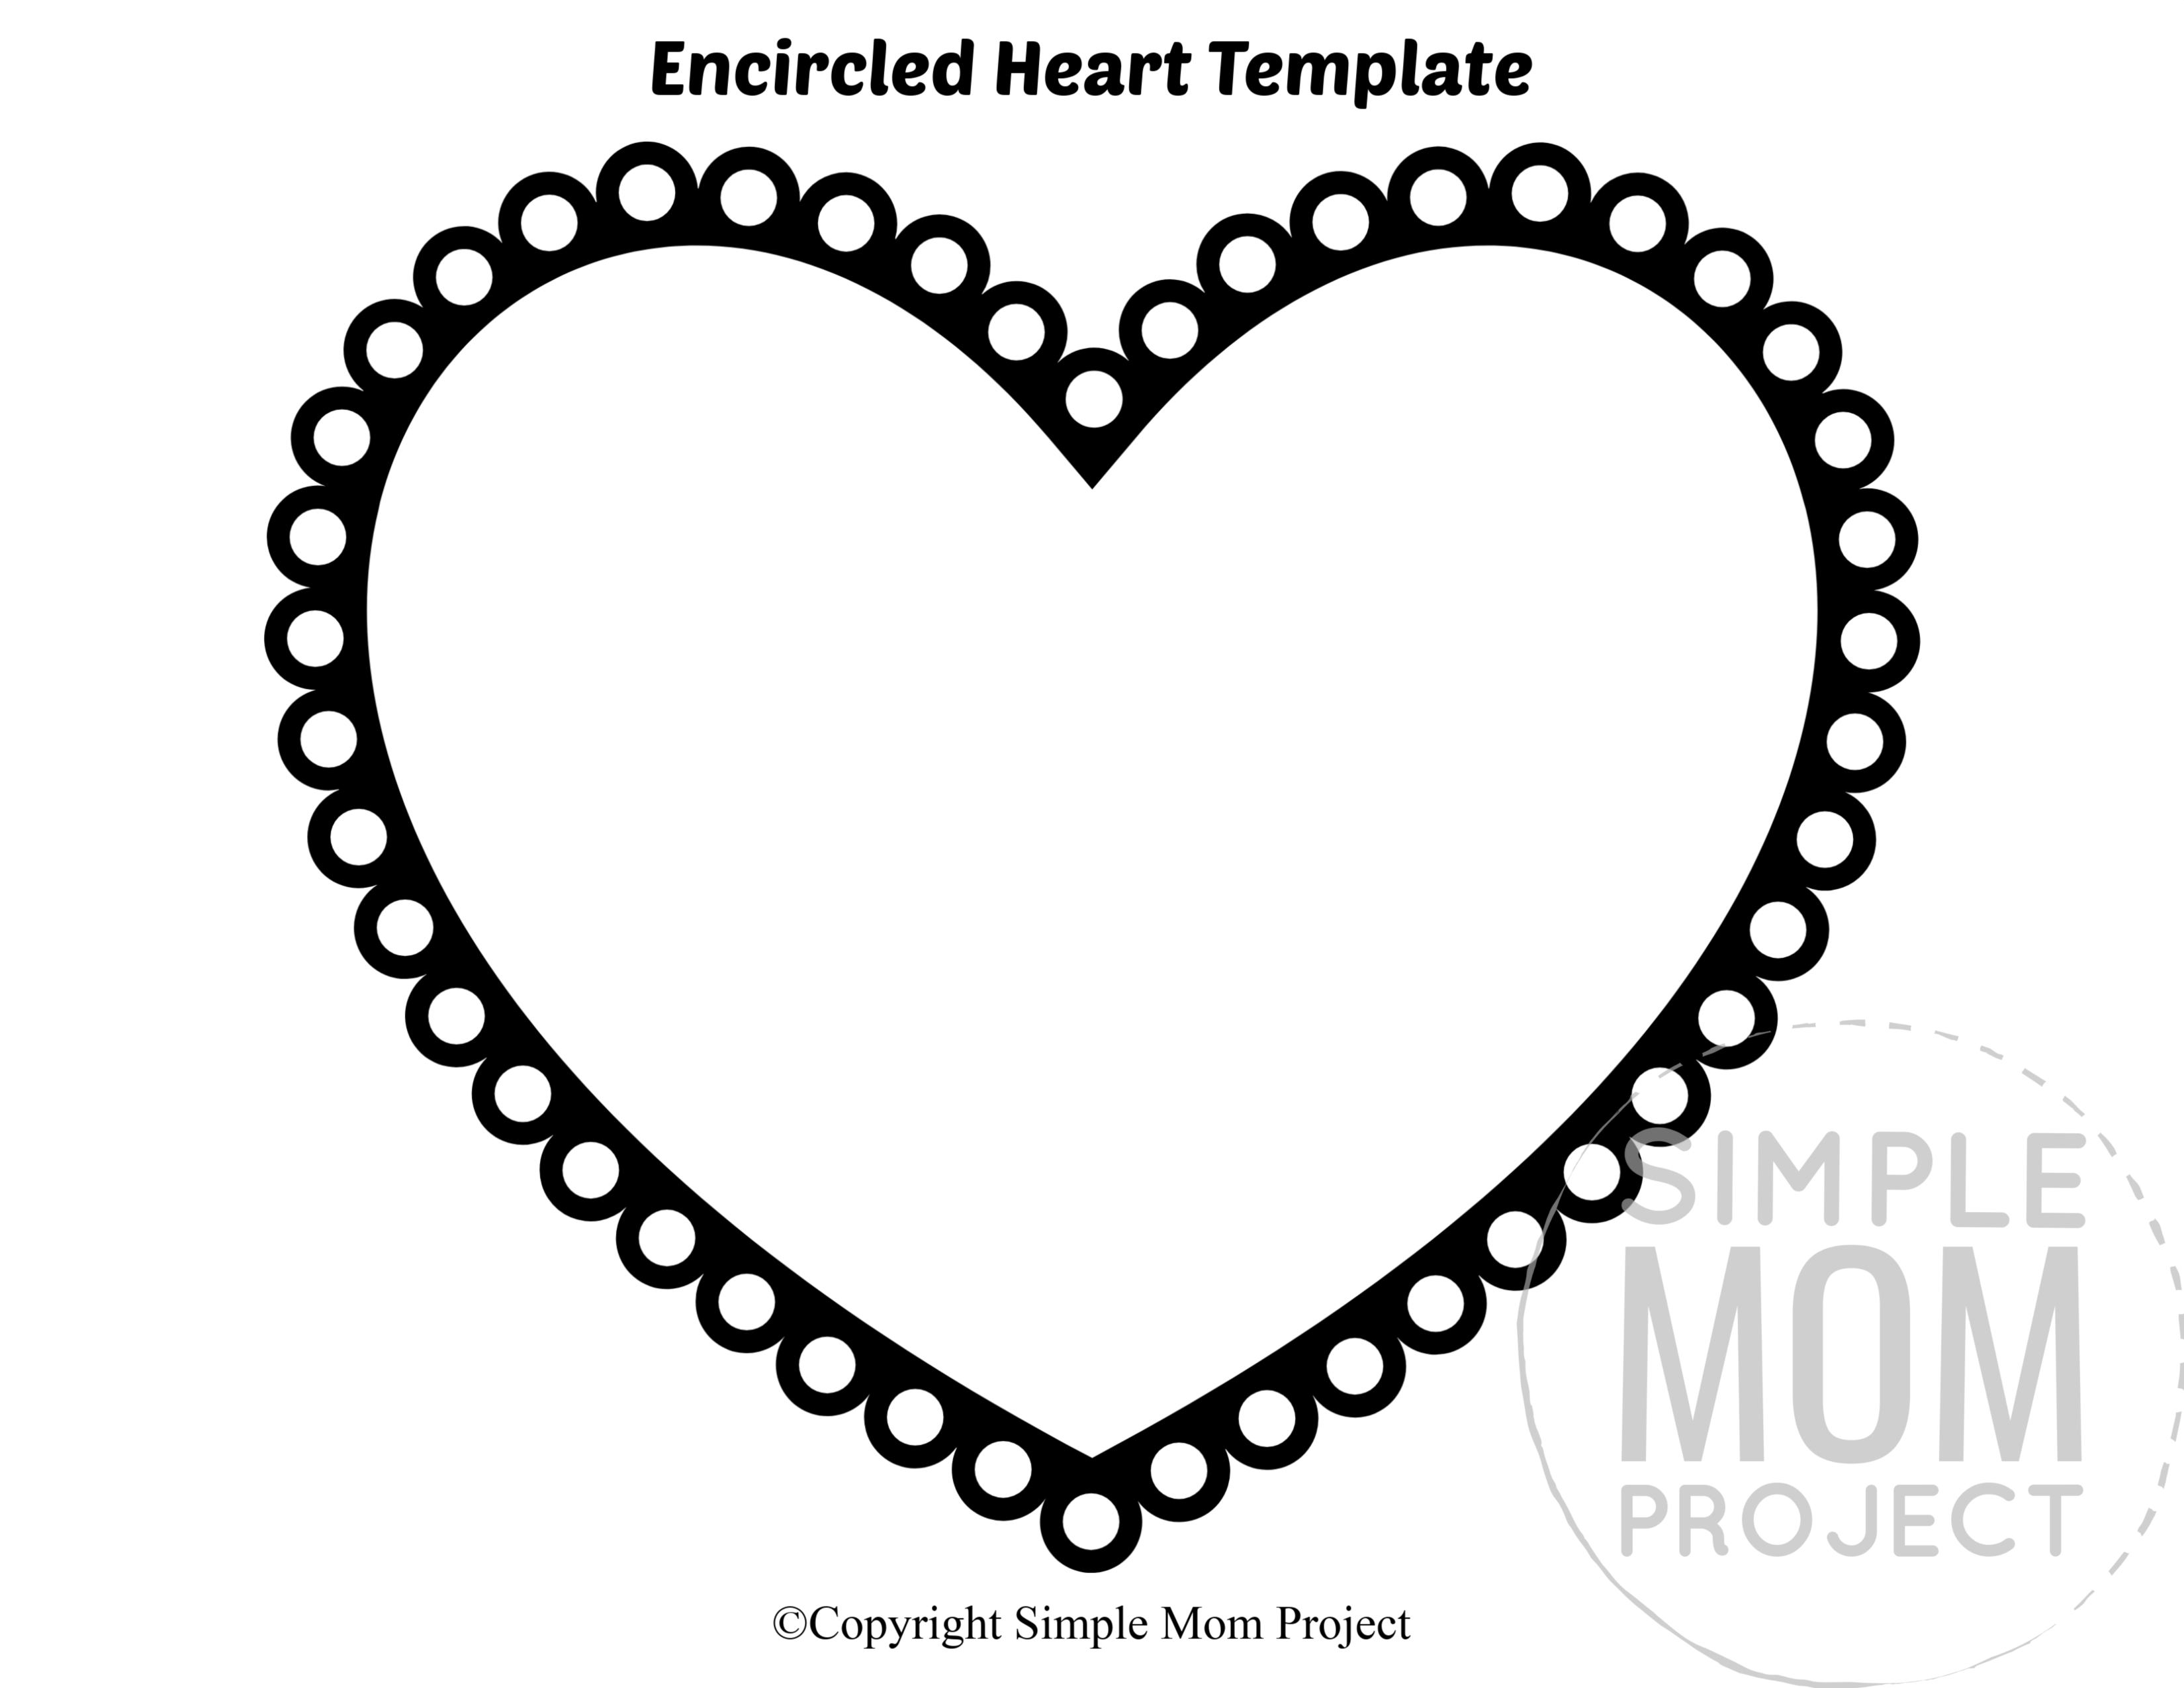 Free Printable Large Heart Shape Templates Simple Mom Project Heart Shapes Template Heart Template Printable Heart Template